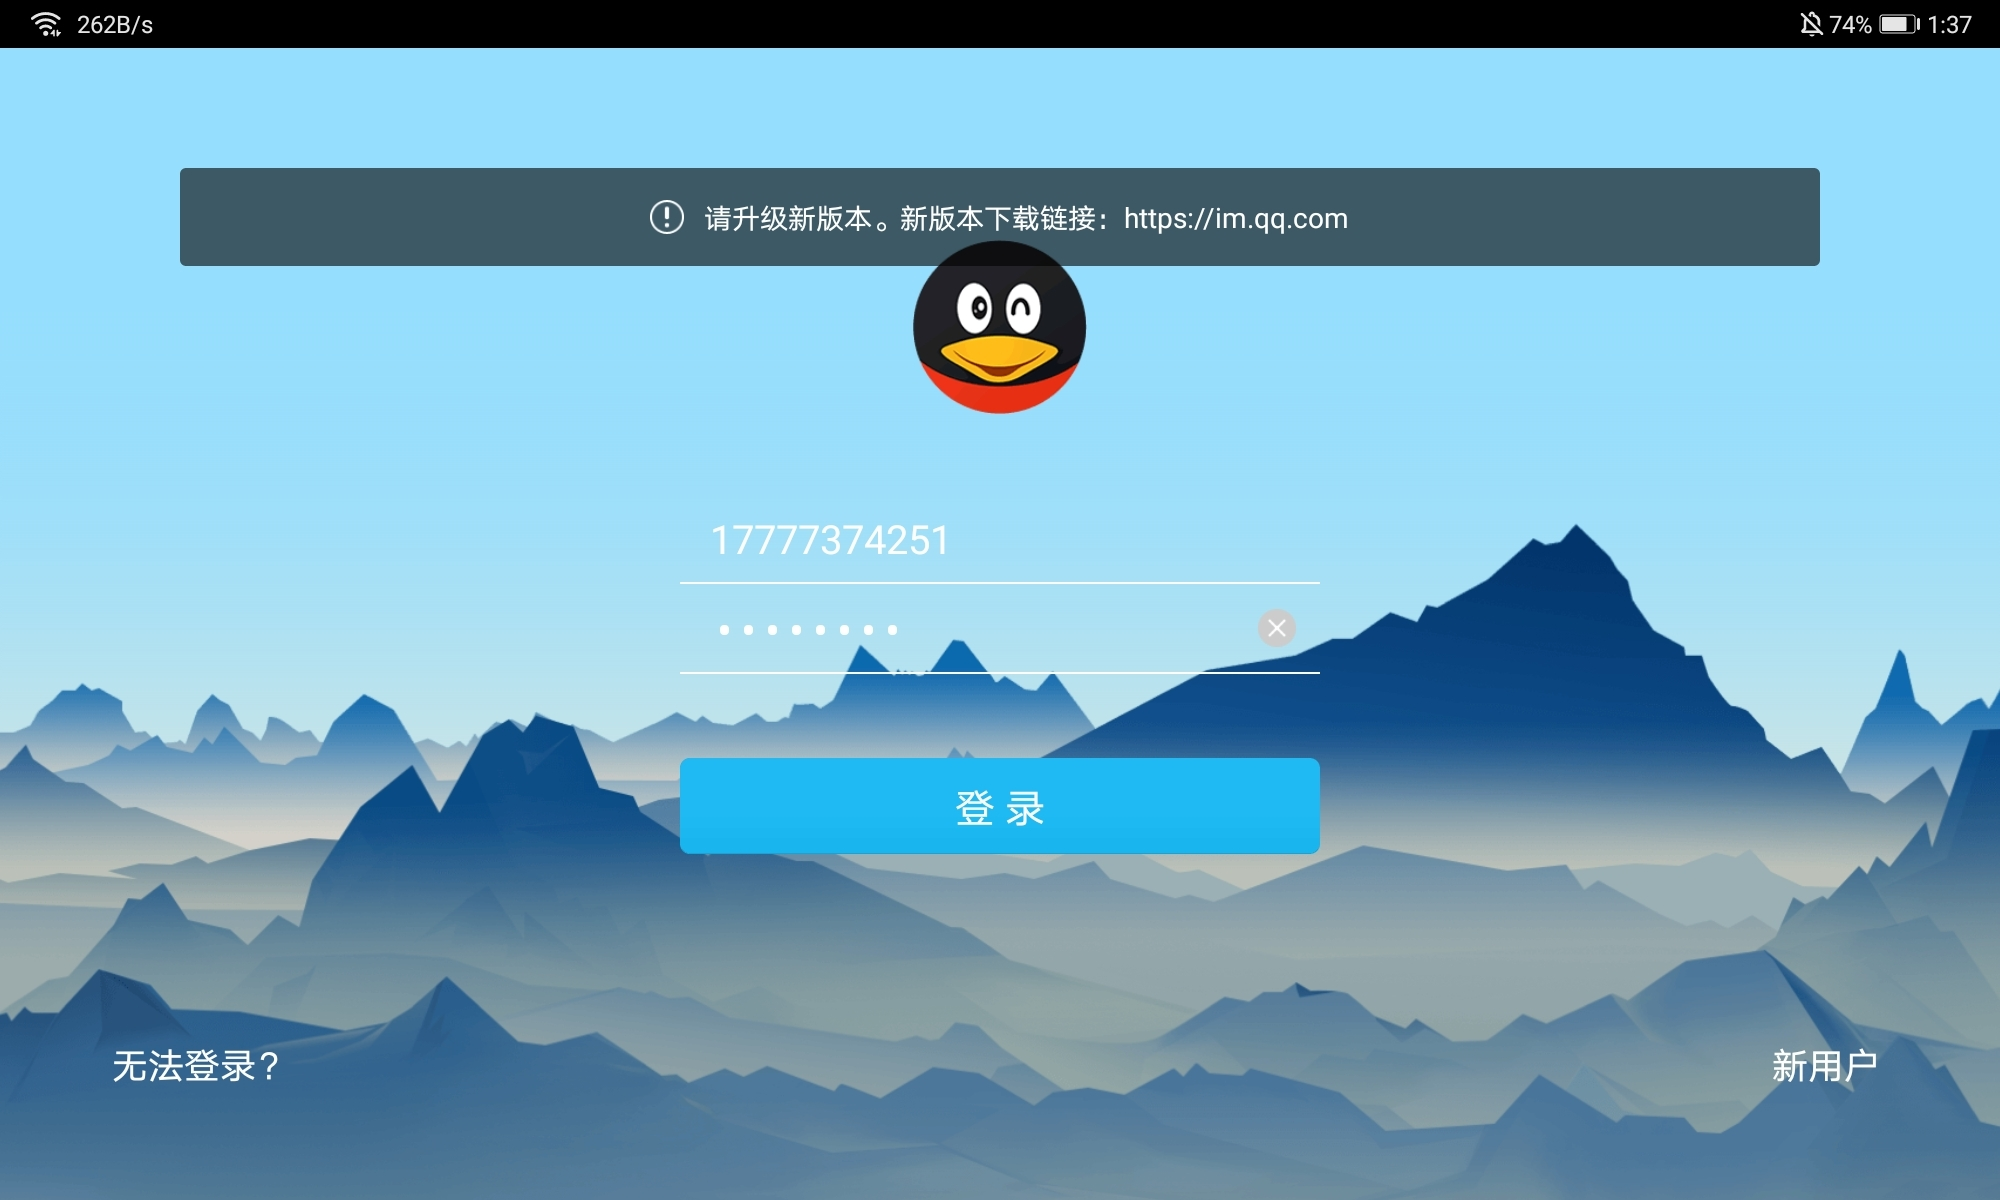 Screenshot_20200517_133737_com.tencent.minihd.qq.jpg